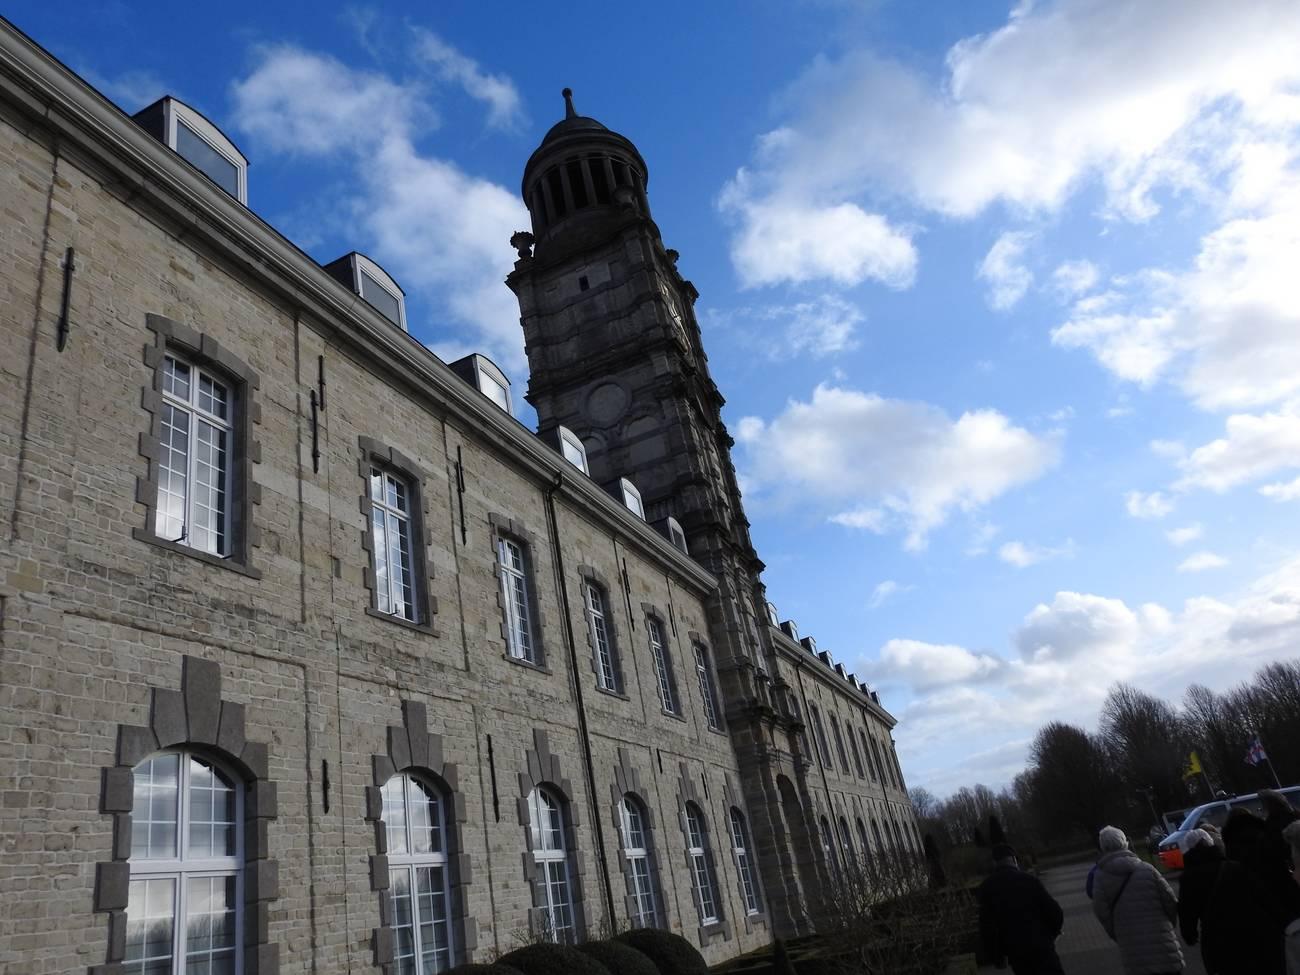 vtbkultuur Leopoldsburg/Hechtel-Eksel